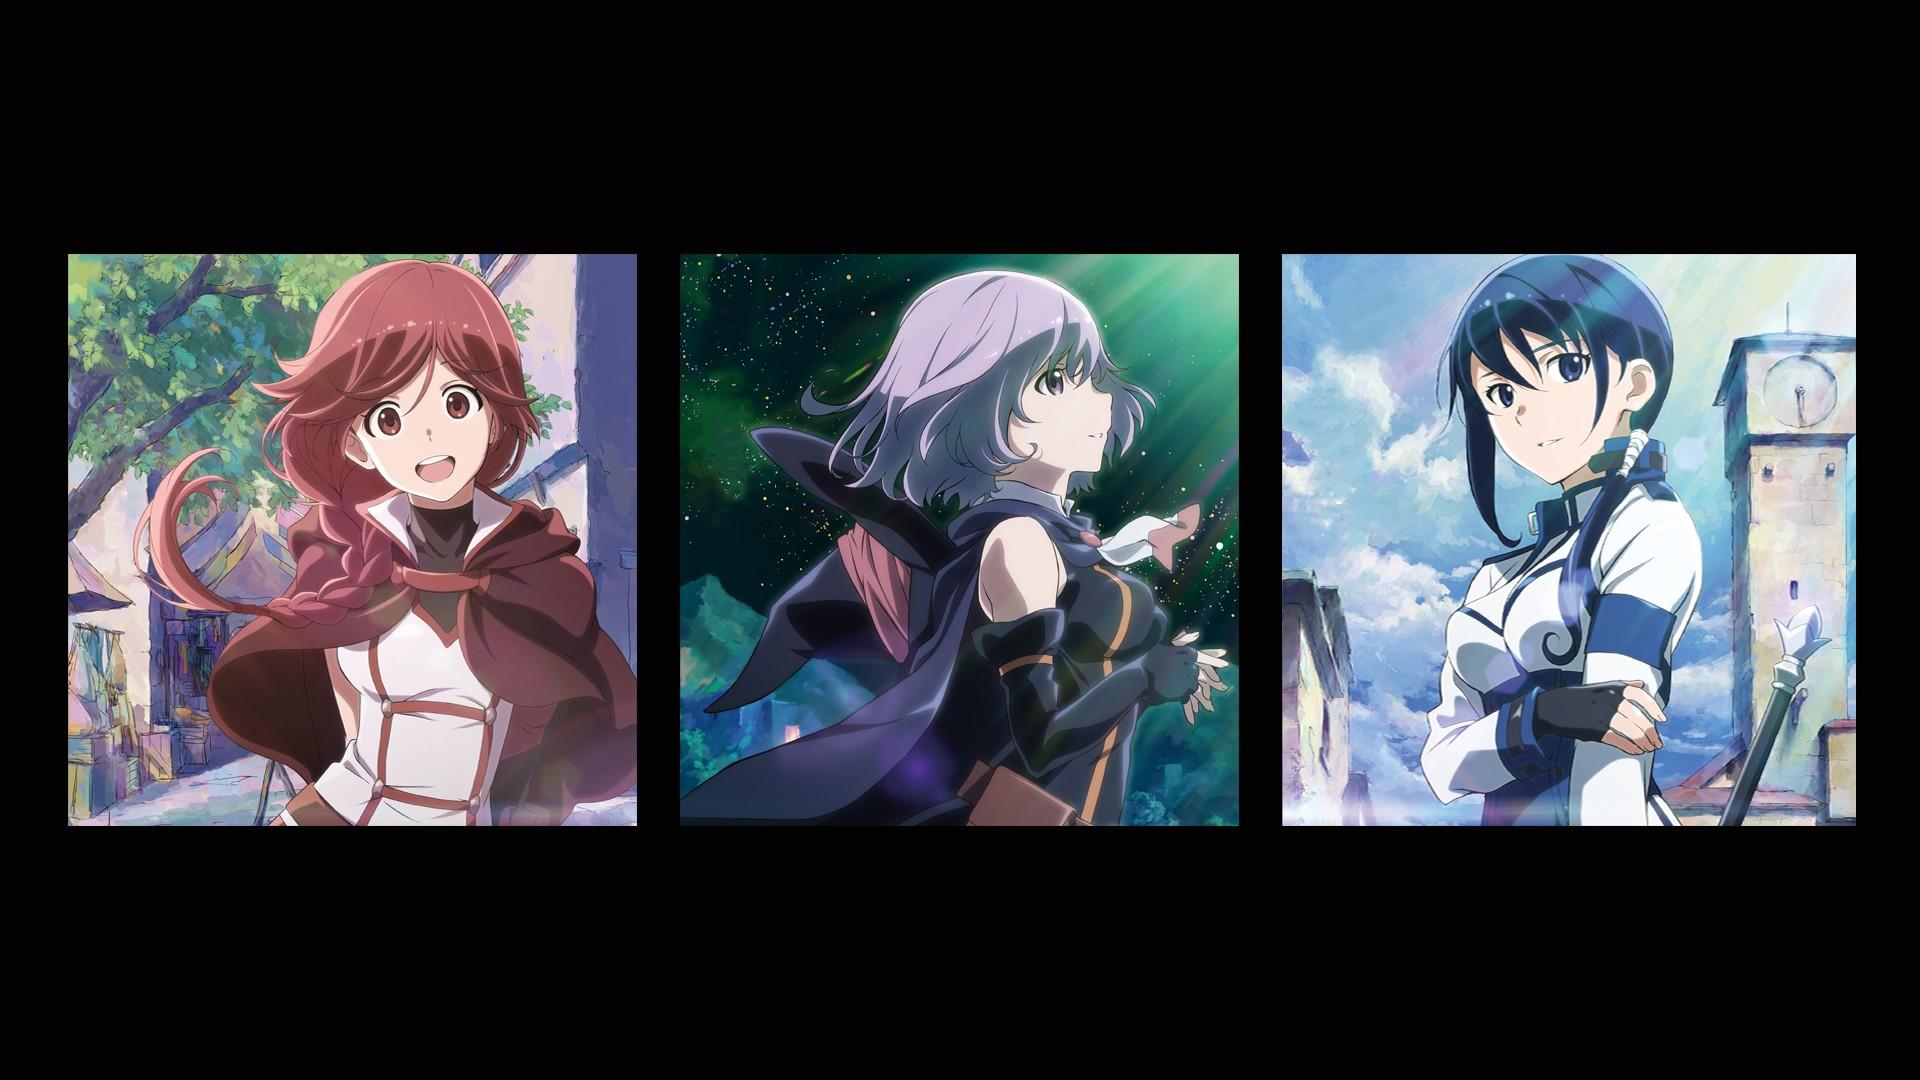 Wallpaper Anime Hai To Gensou No Grimgar Screenshot 1920x1080